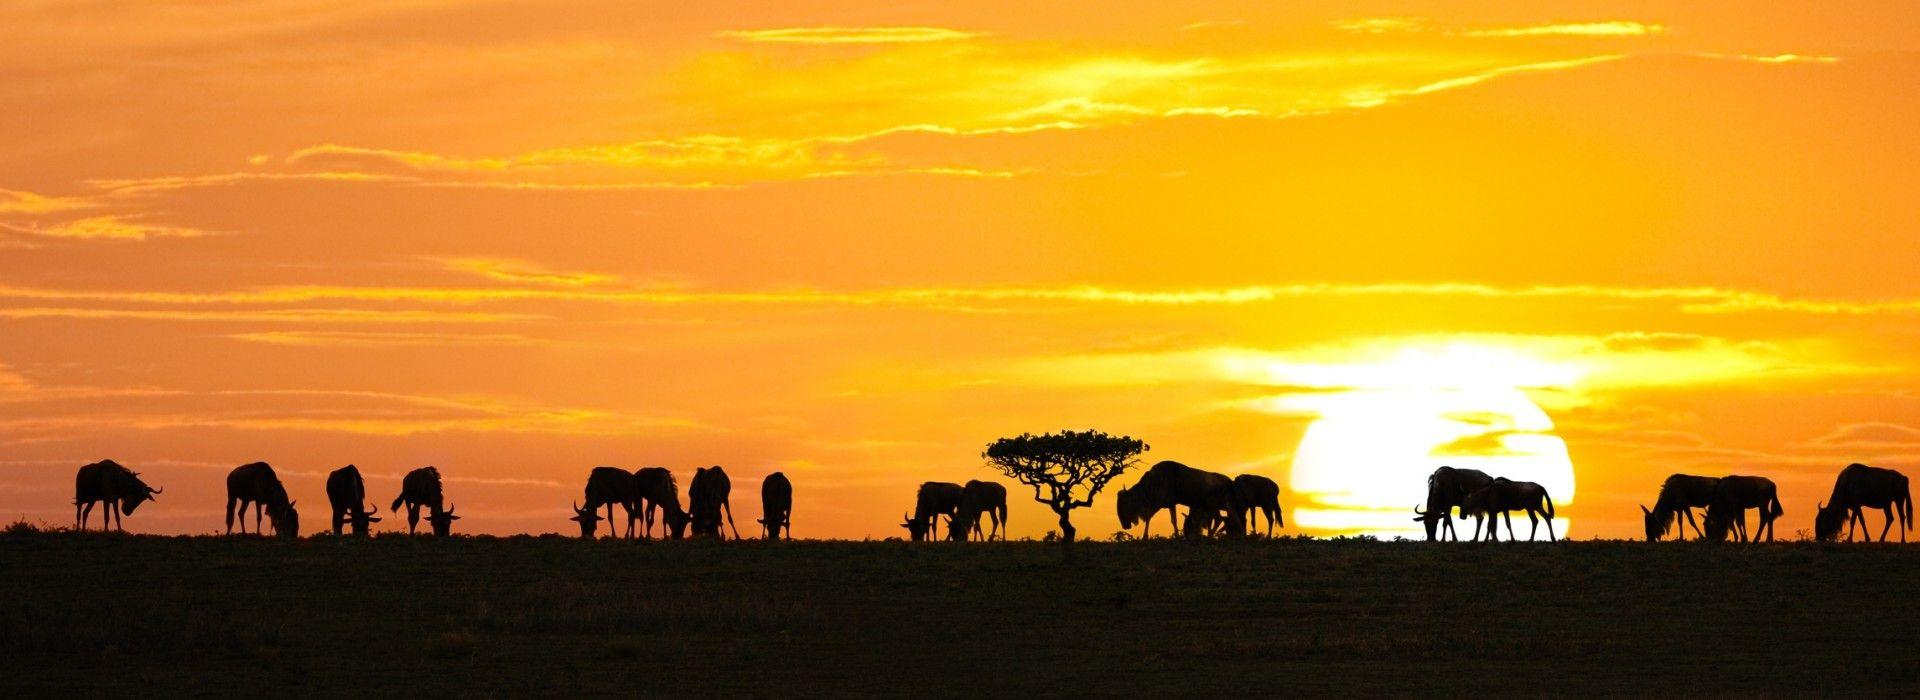 Sightseeing Tours in Tanzania